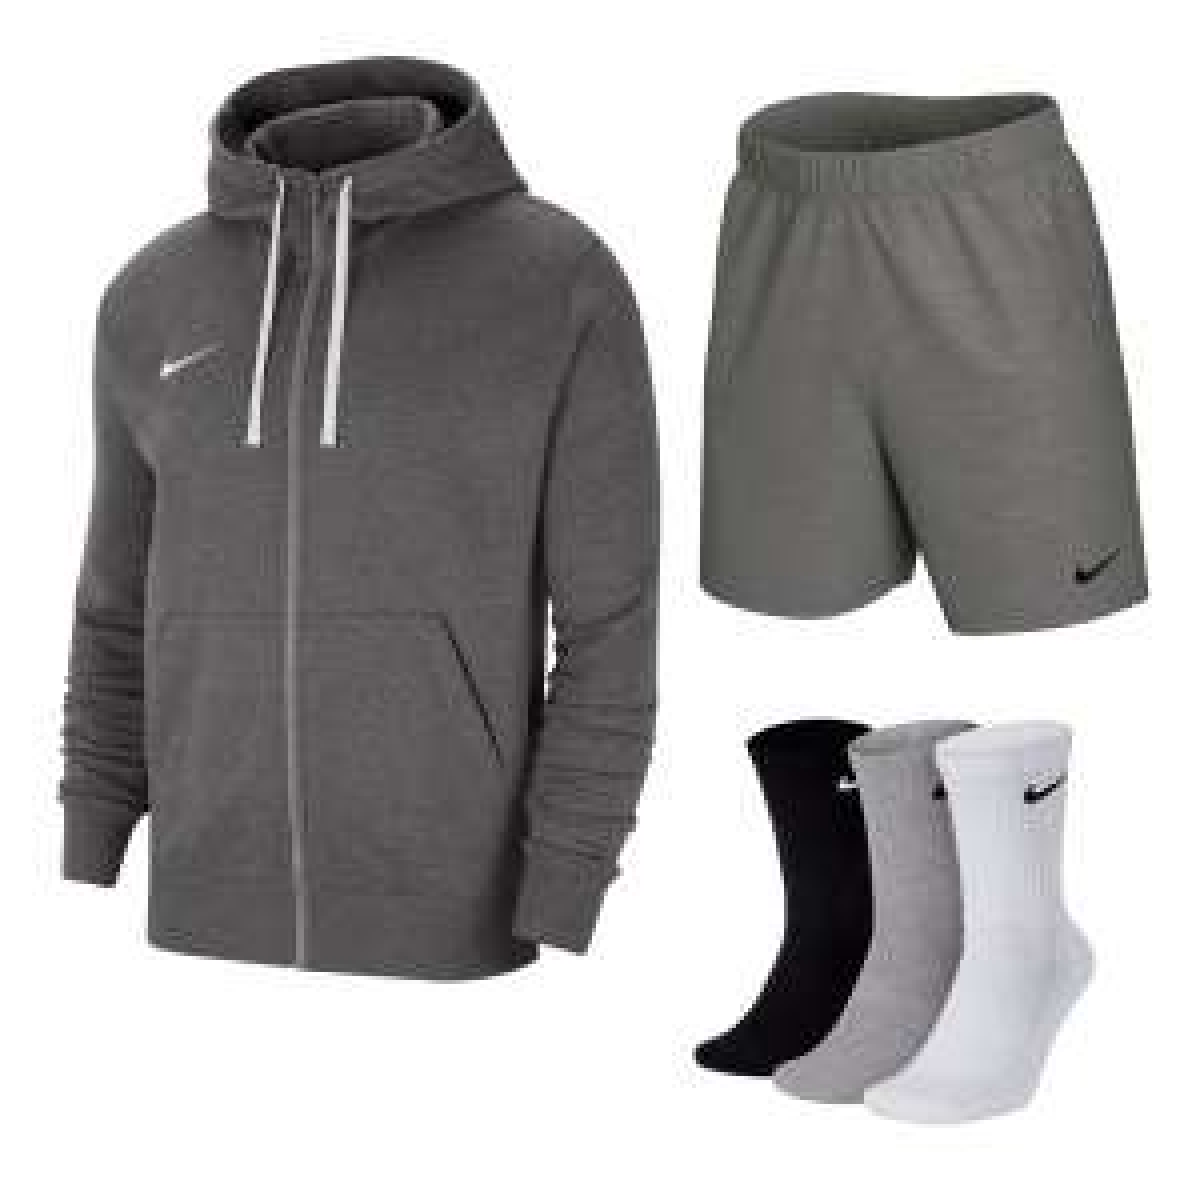 Nike Team Park 20 Outfit (Kapuzenjacke, Shorts, 3 Paar Socken)